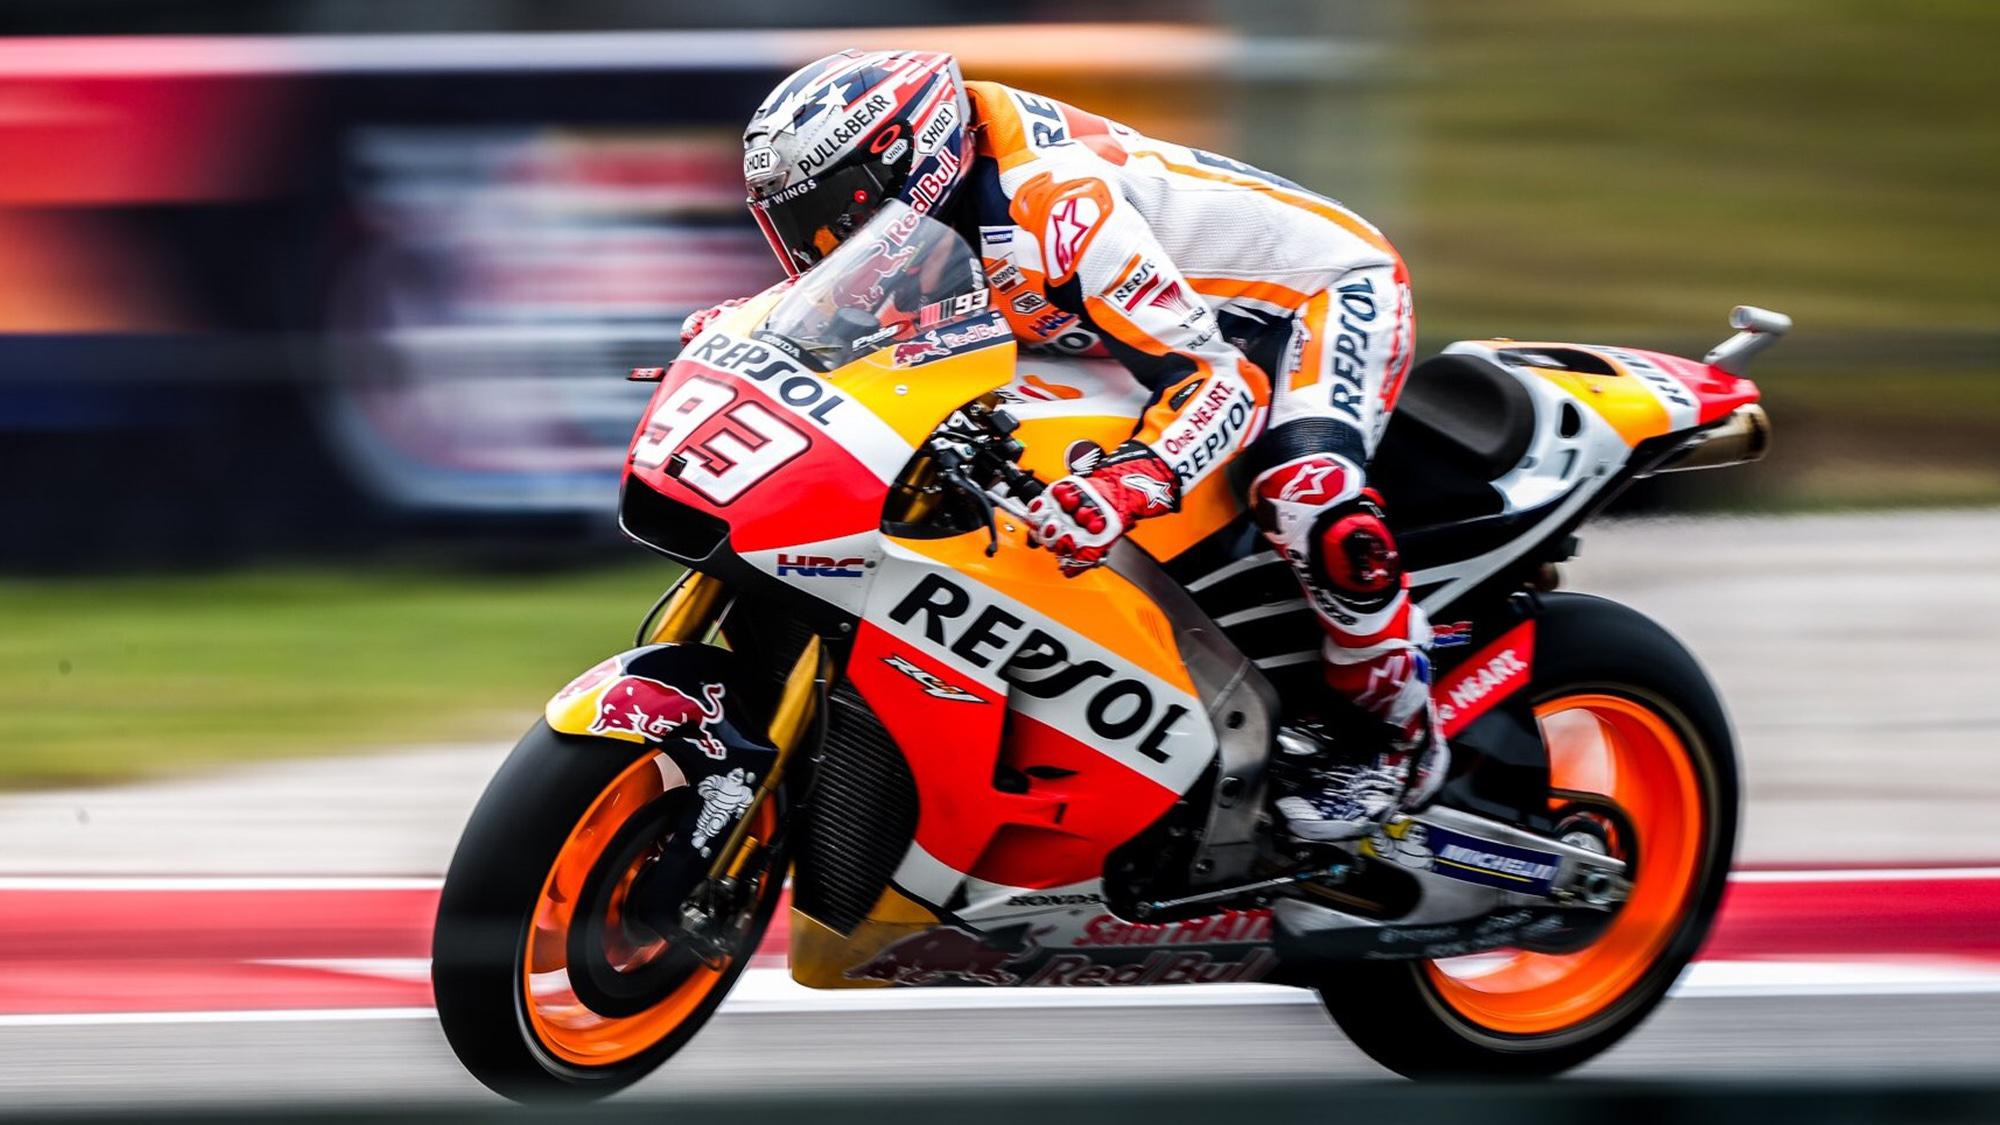 Marc Marquez on his MotoGP Honda bike